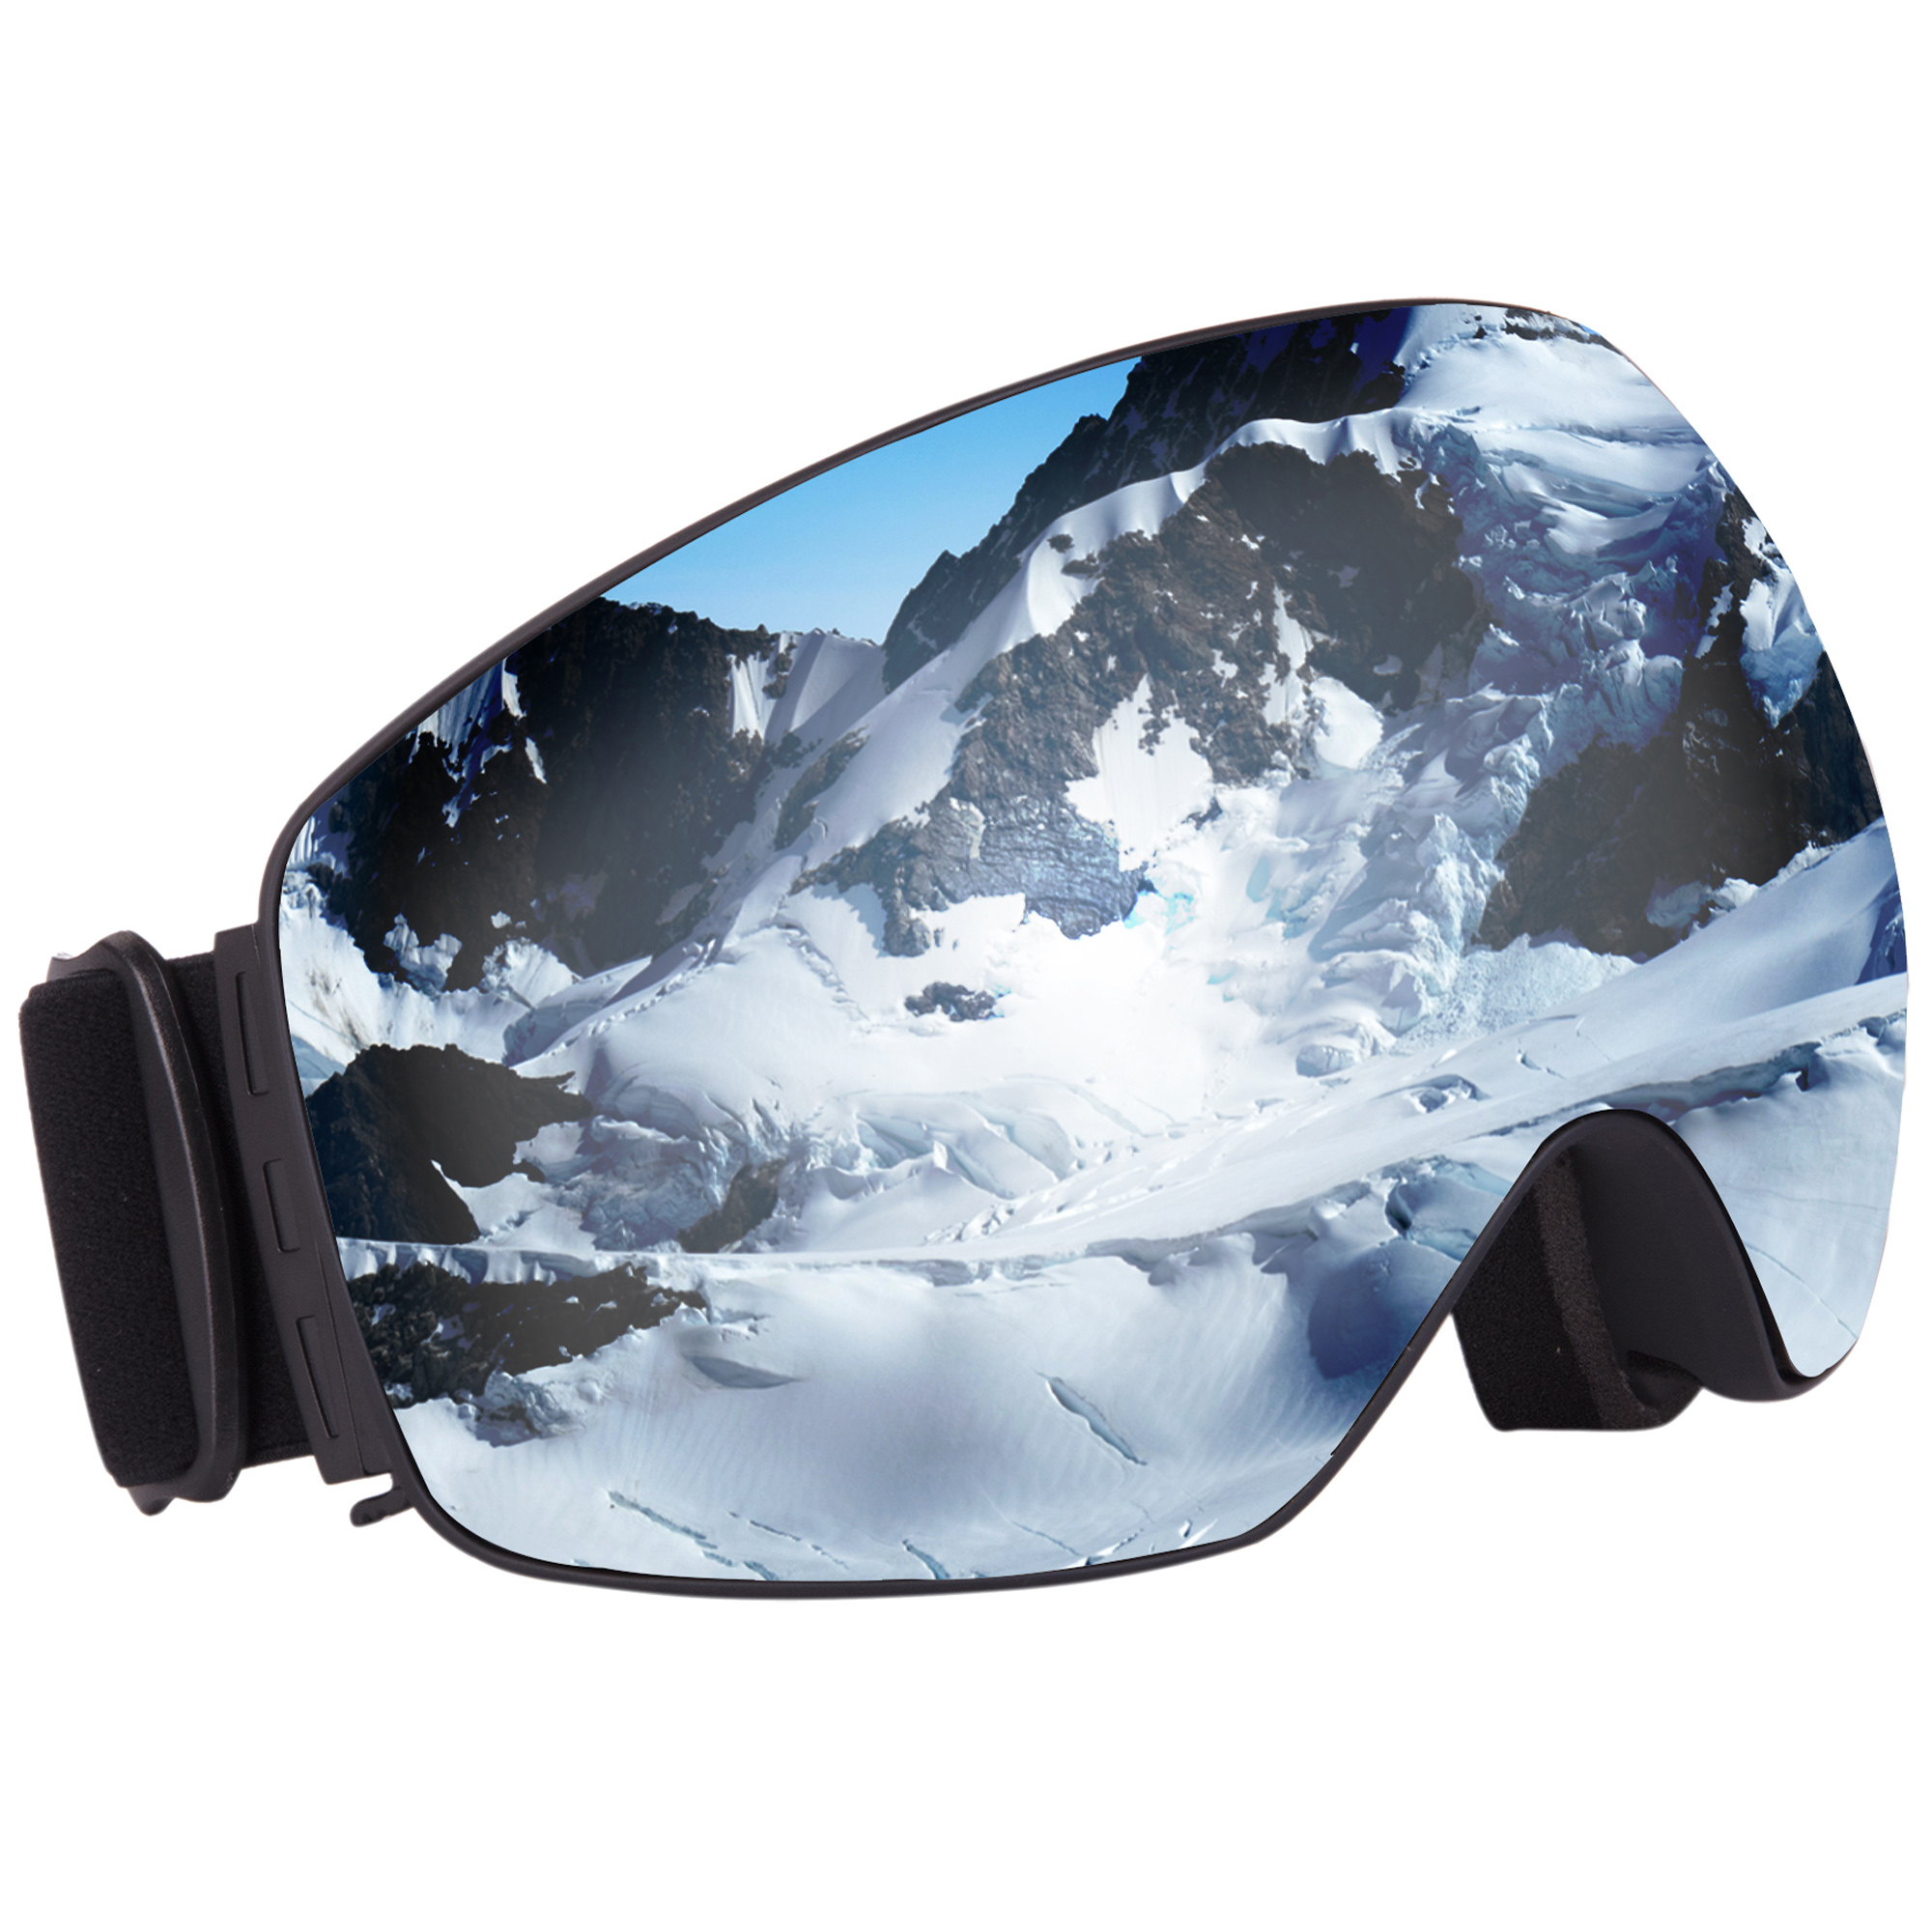 Black Outdoor Windproof Ski Snow Glasses Climbing Goggles for Kids Children